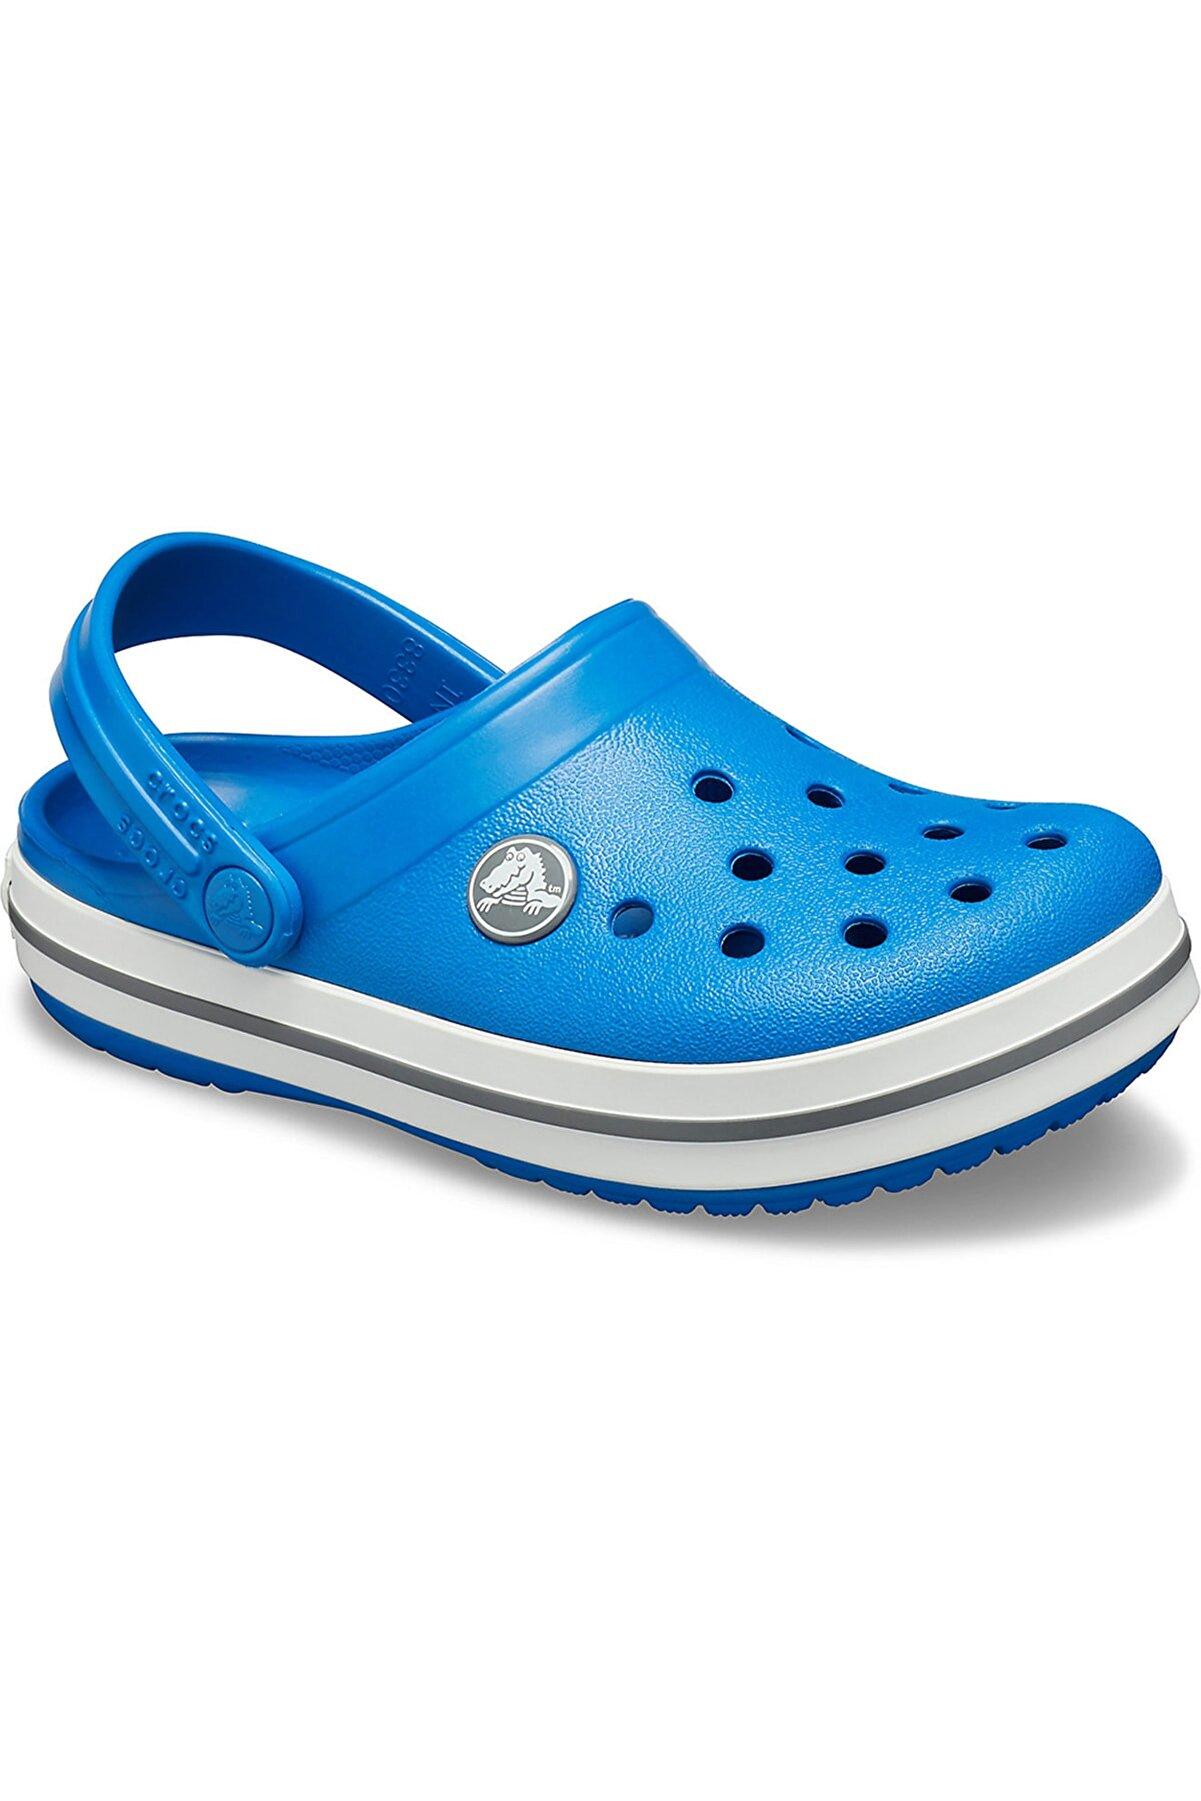 Crocs Crocband Clog K - Unisex Çocuk Mavi  Spor Sandalet